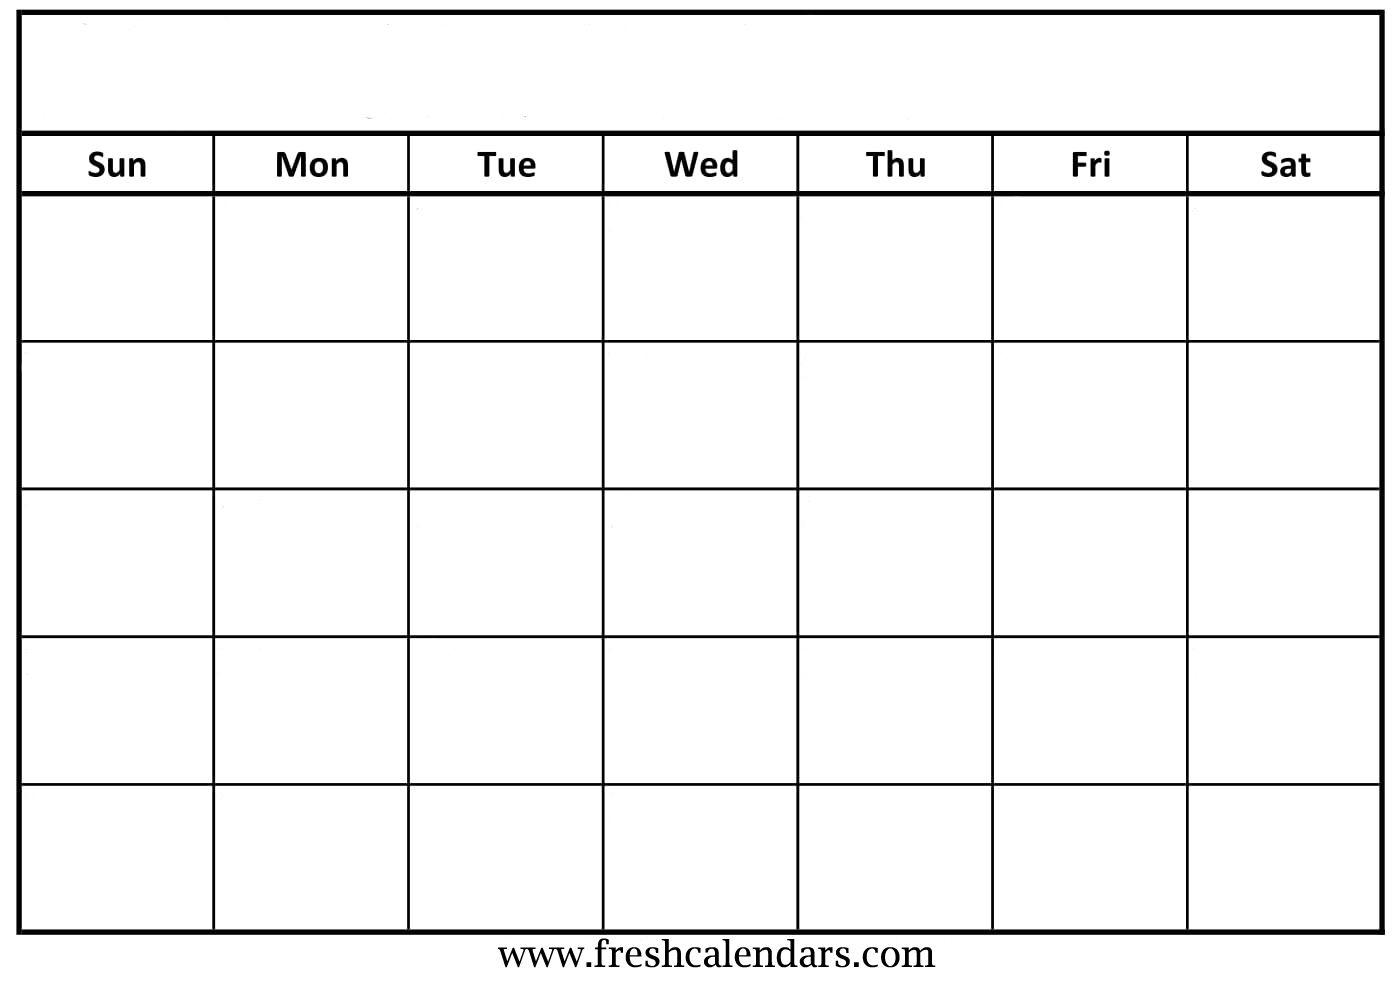 Free Printable Calendar Templates Brochure September 2018 Yearly within Free Printable Blank Calendar Templates